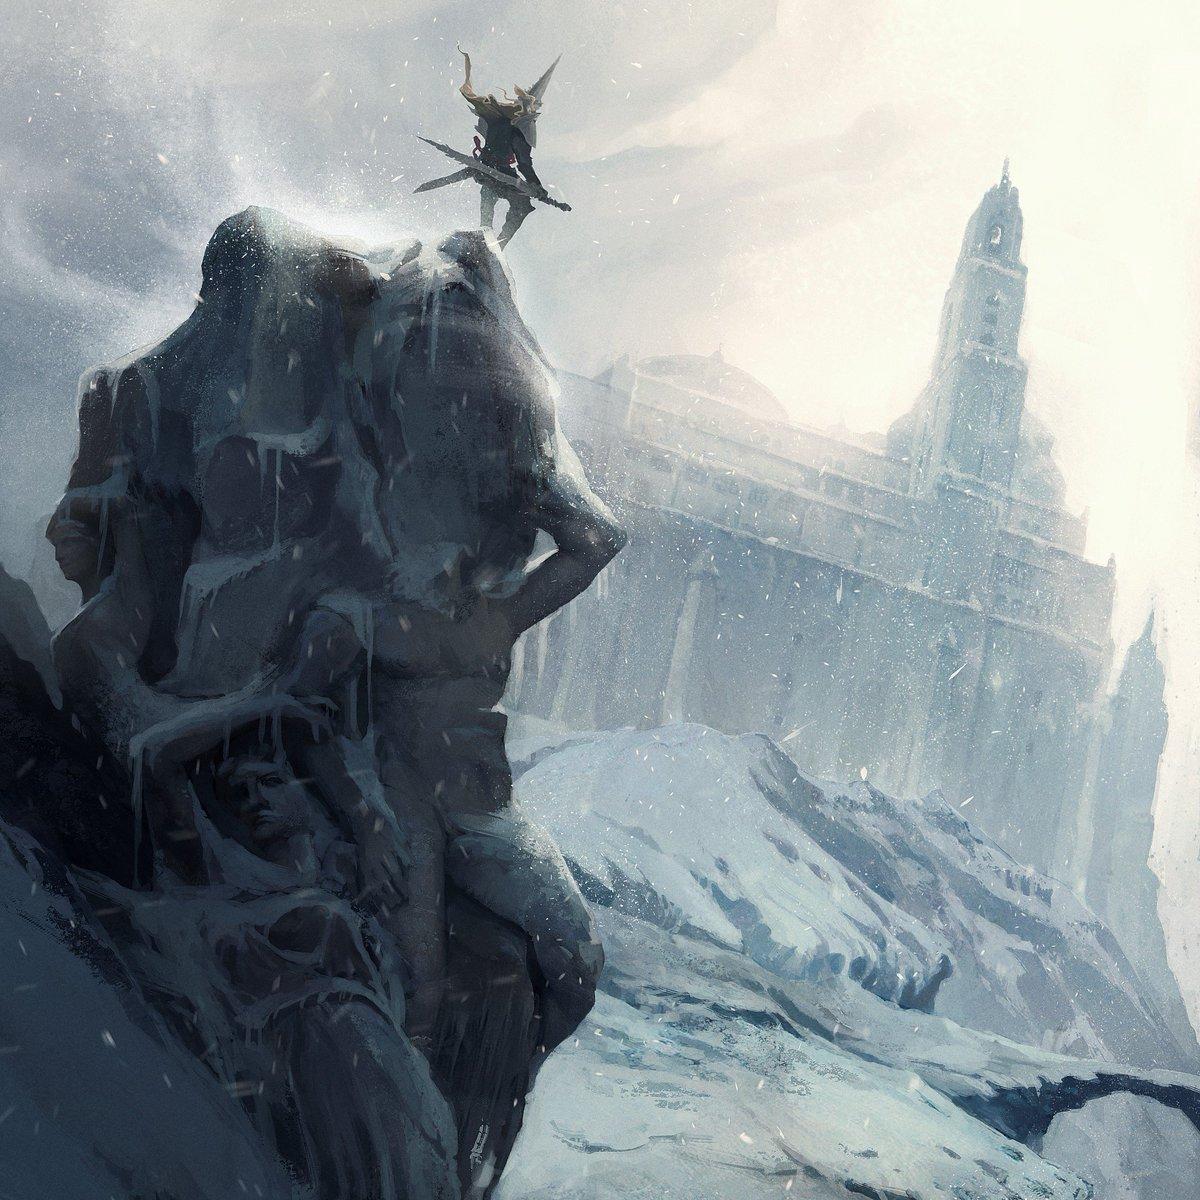 &quot;Frozen summit&quot; scenary concept art #indiedev #digitalart #art<br>http://pic.twitter.com/fZMqGdNRsO